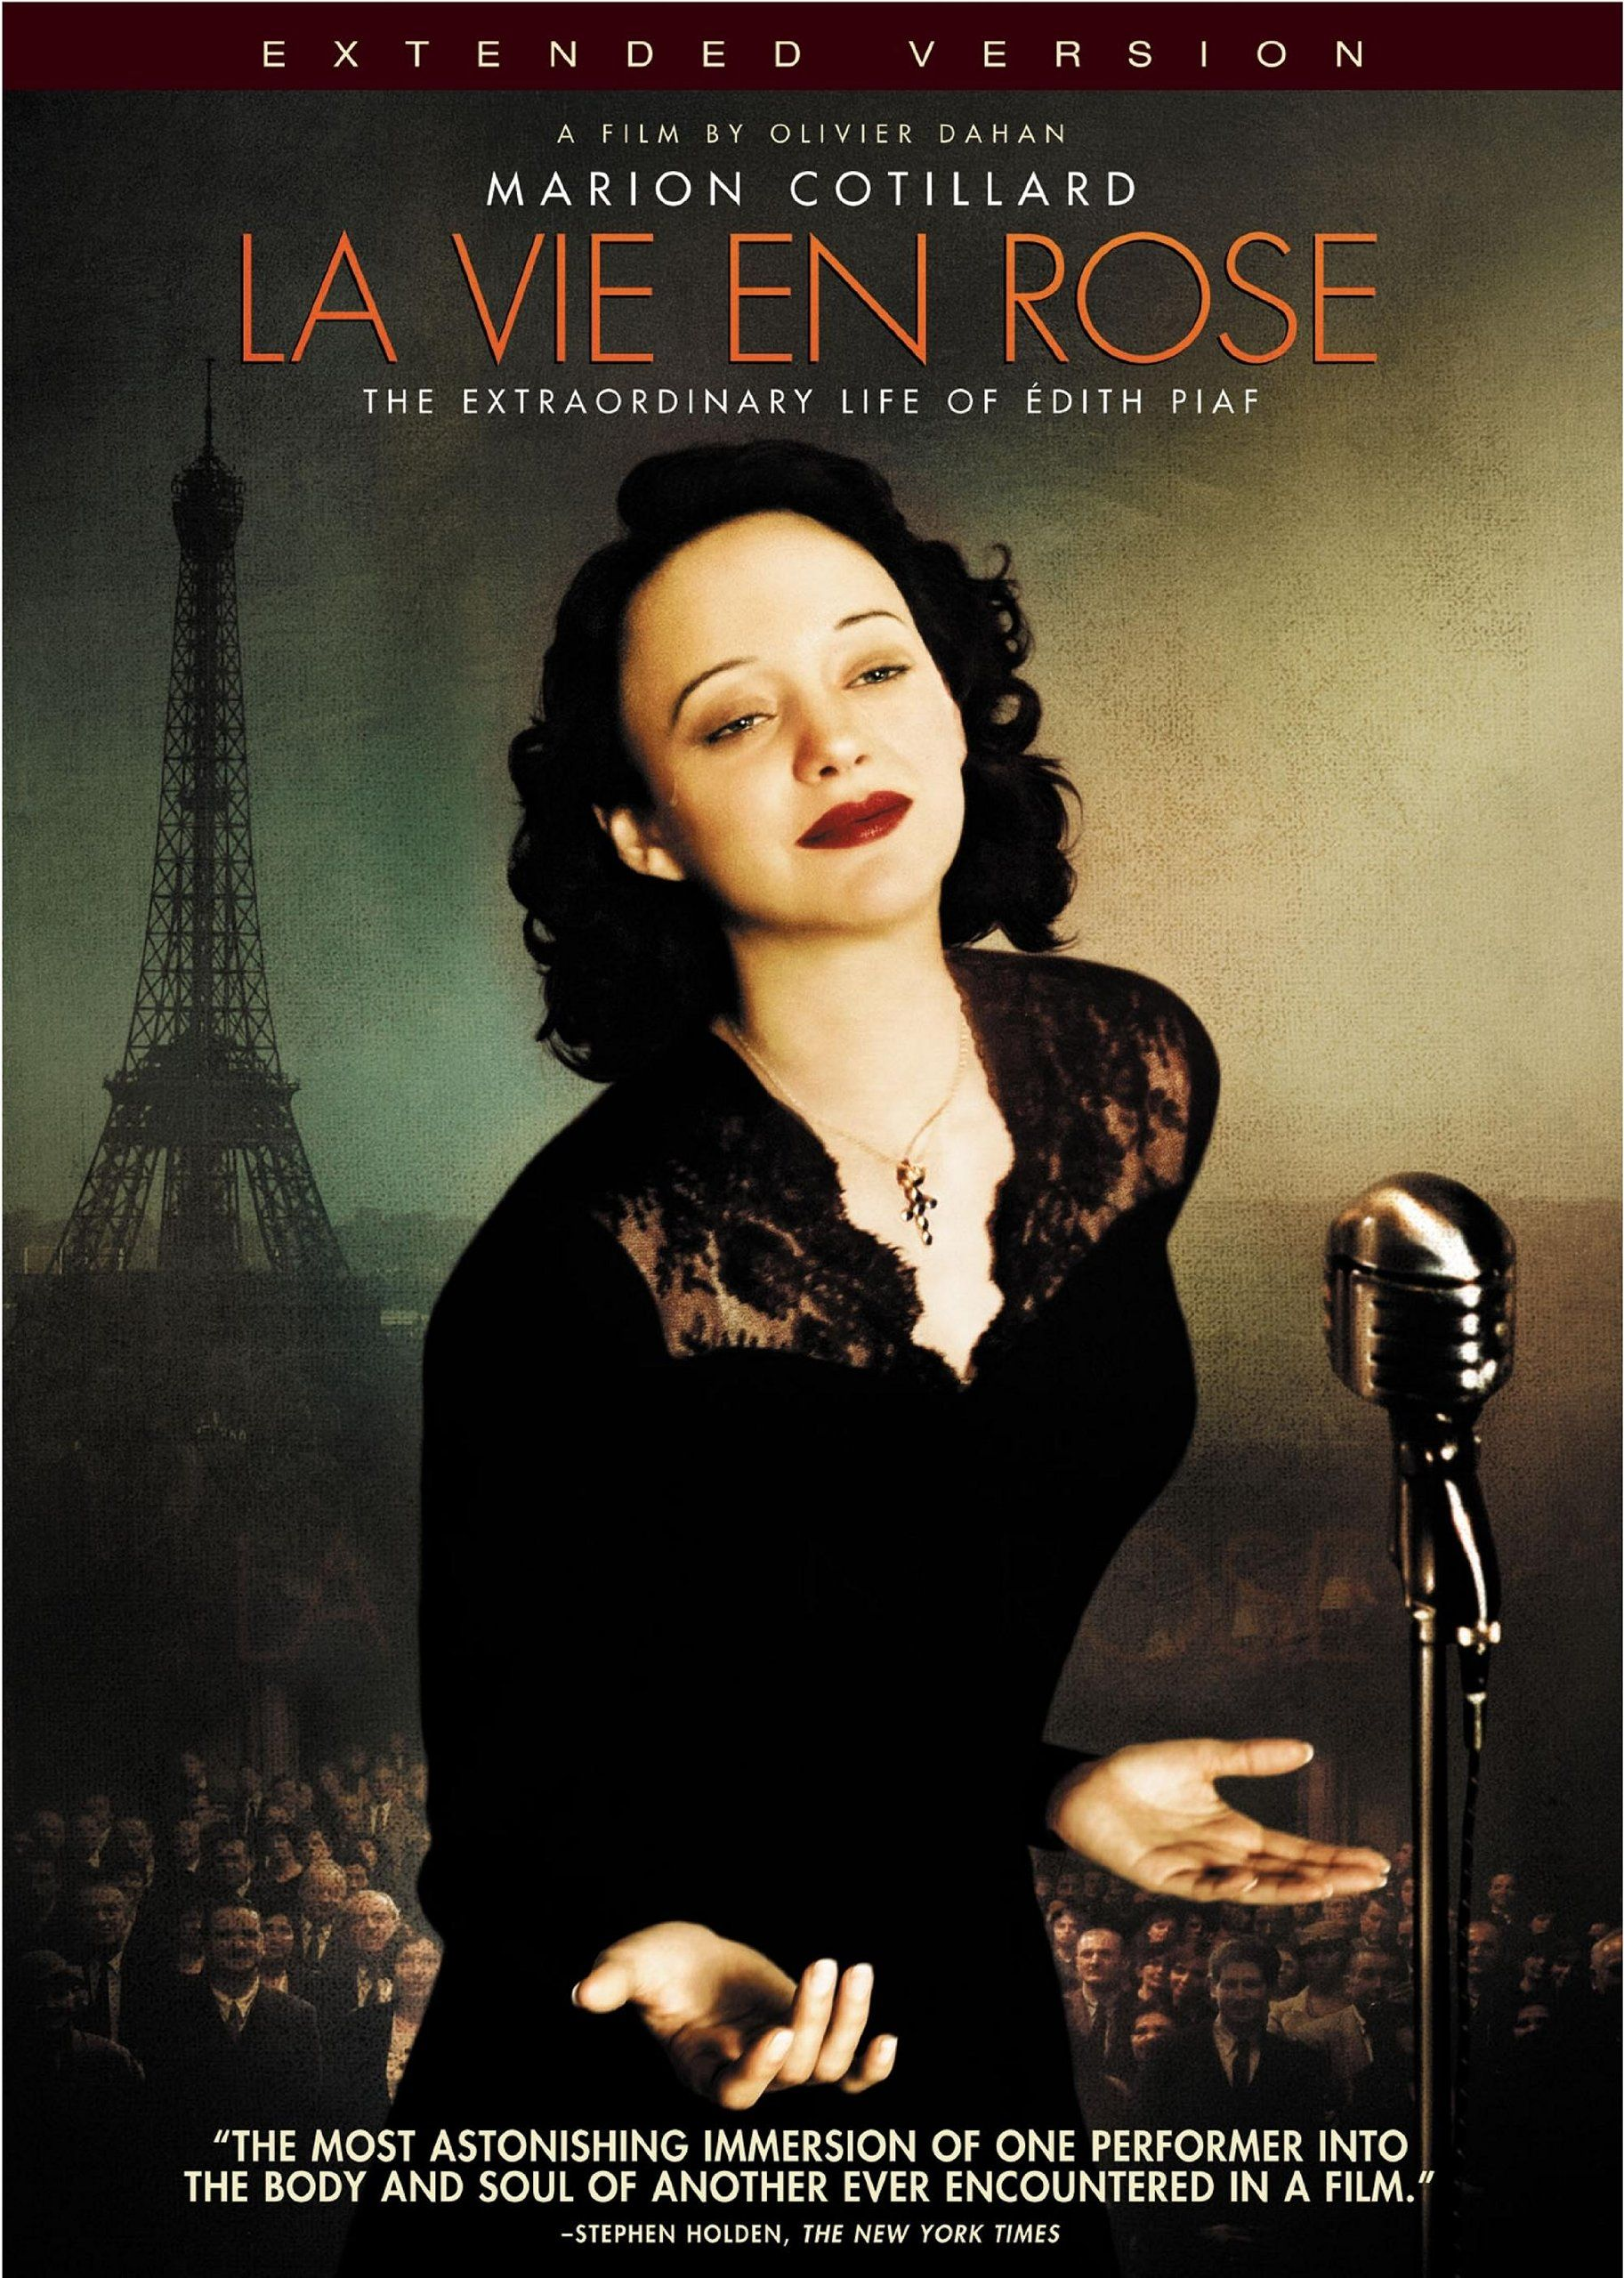 Je Parle Francais La Vie En Rose Cine Frances Las Mejores Peliculas Para Aprender Frances Movies La Vie Film